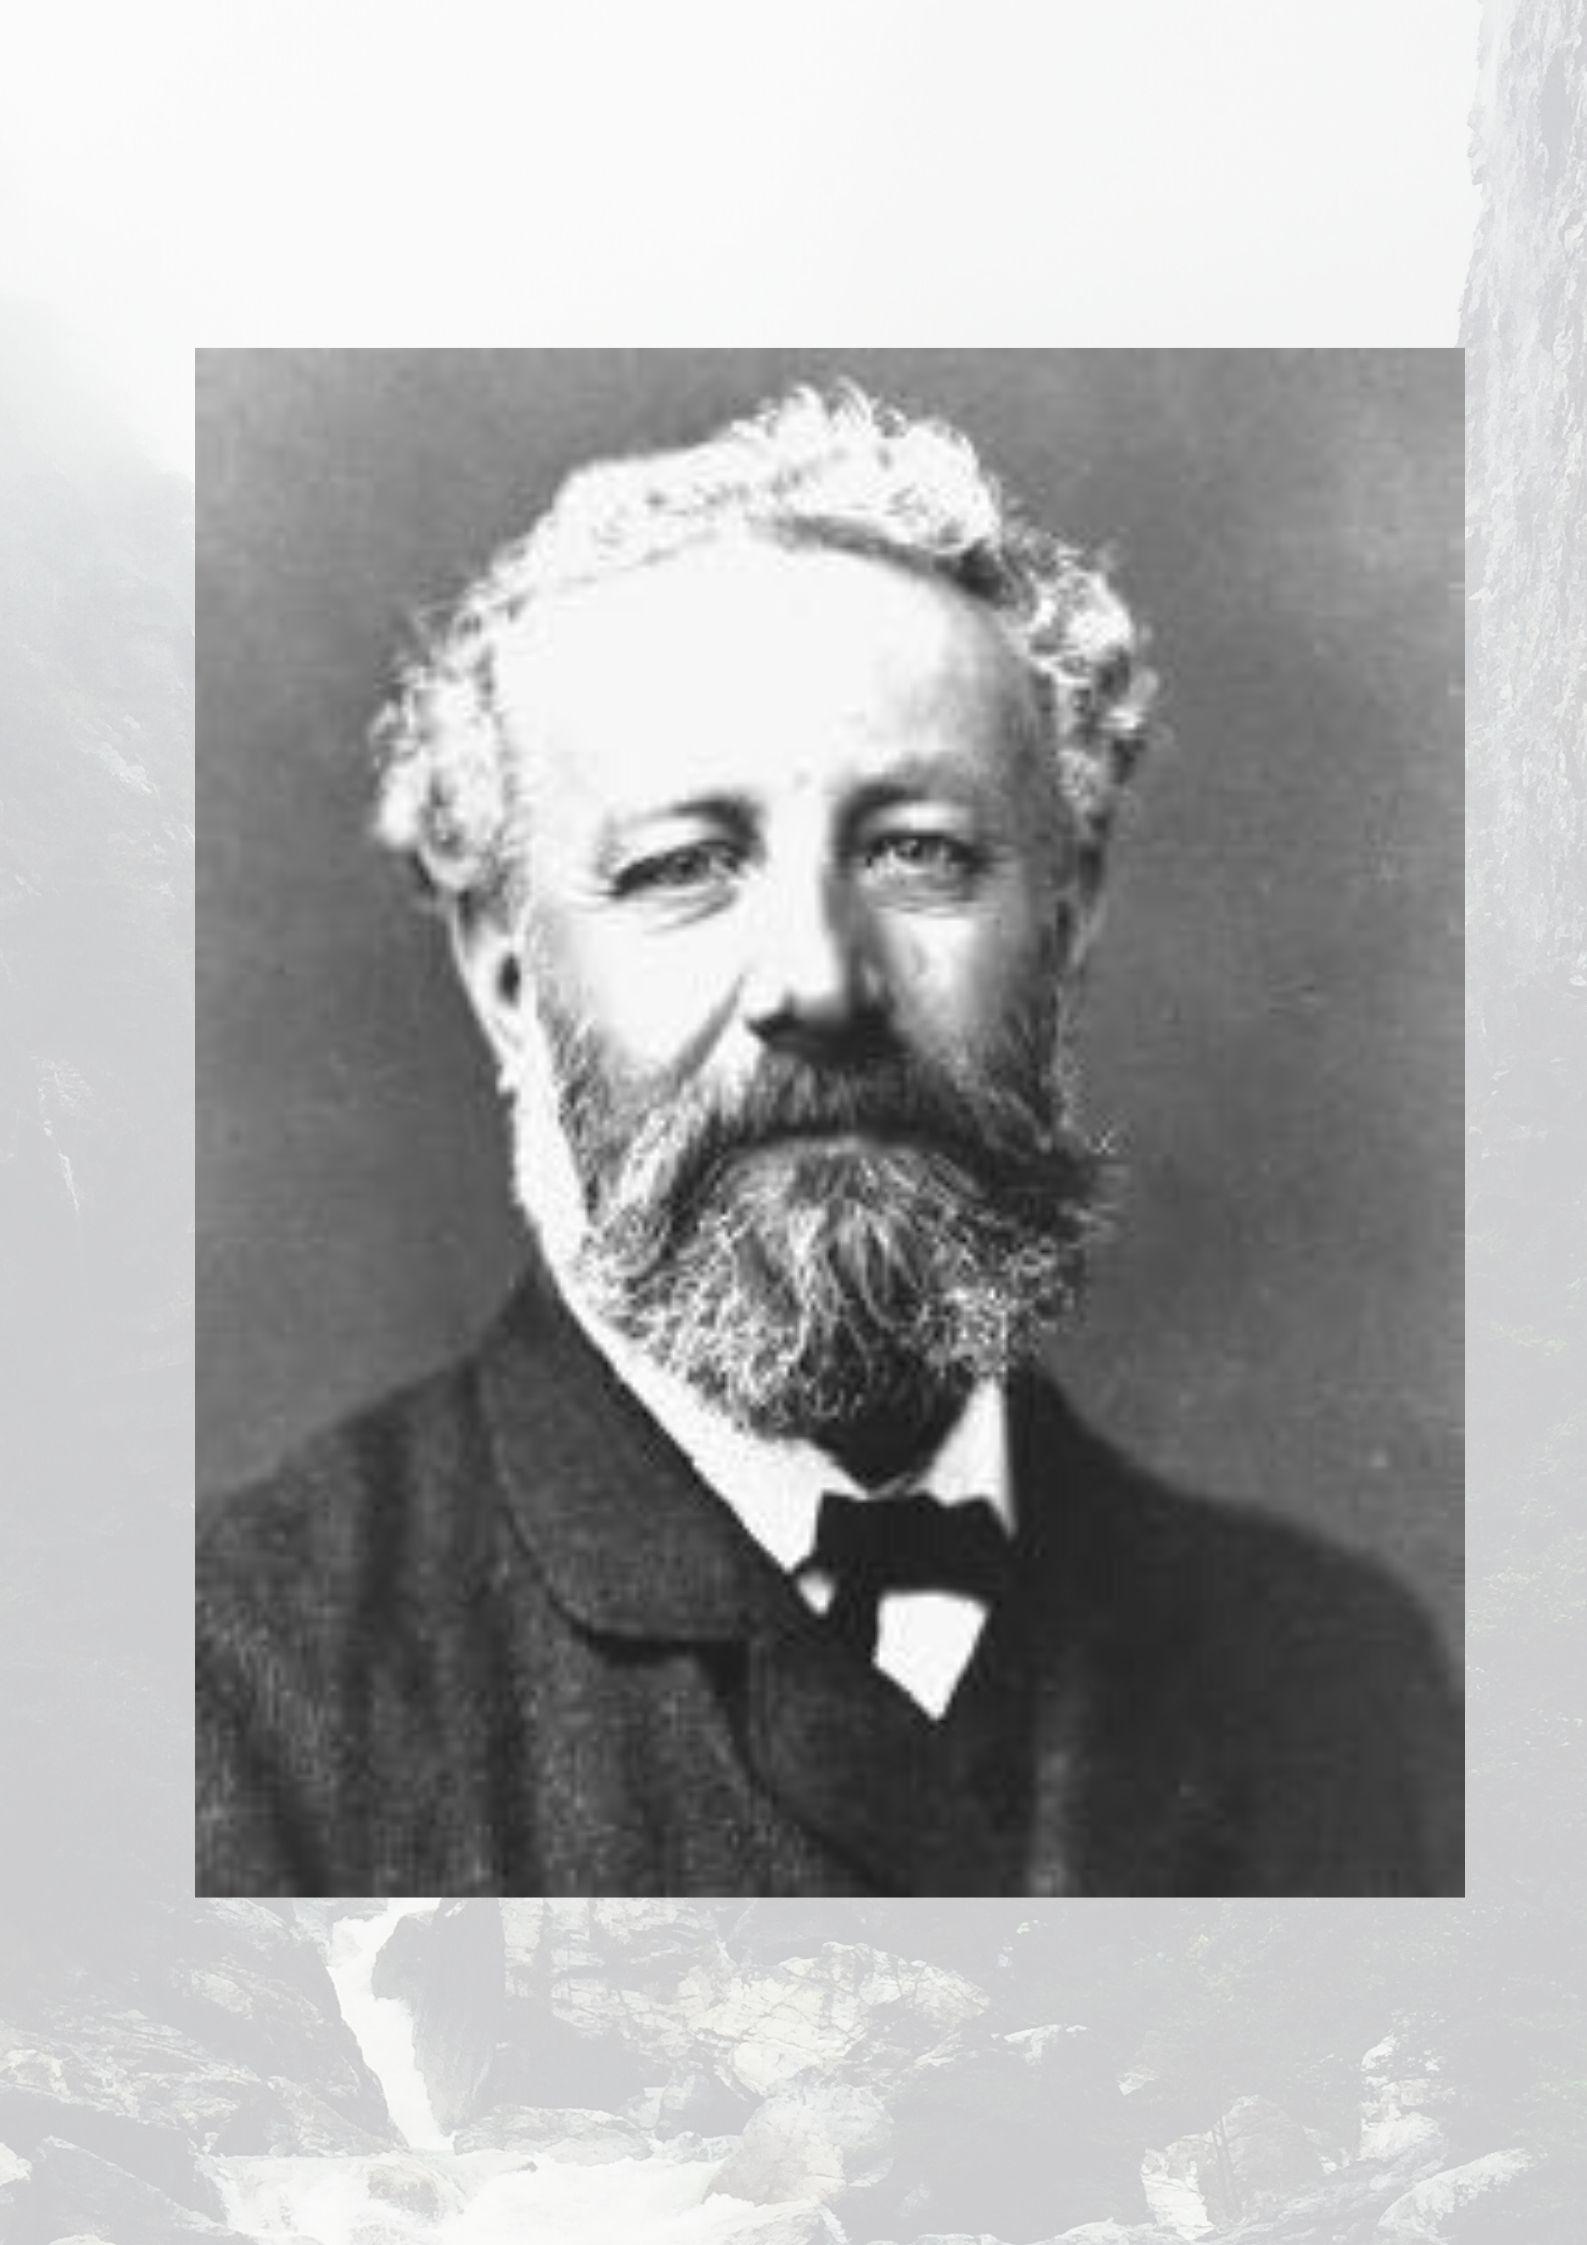 zdjęcie - portret Juliusza Verne'a